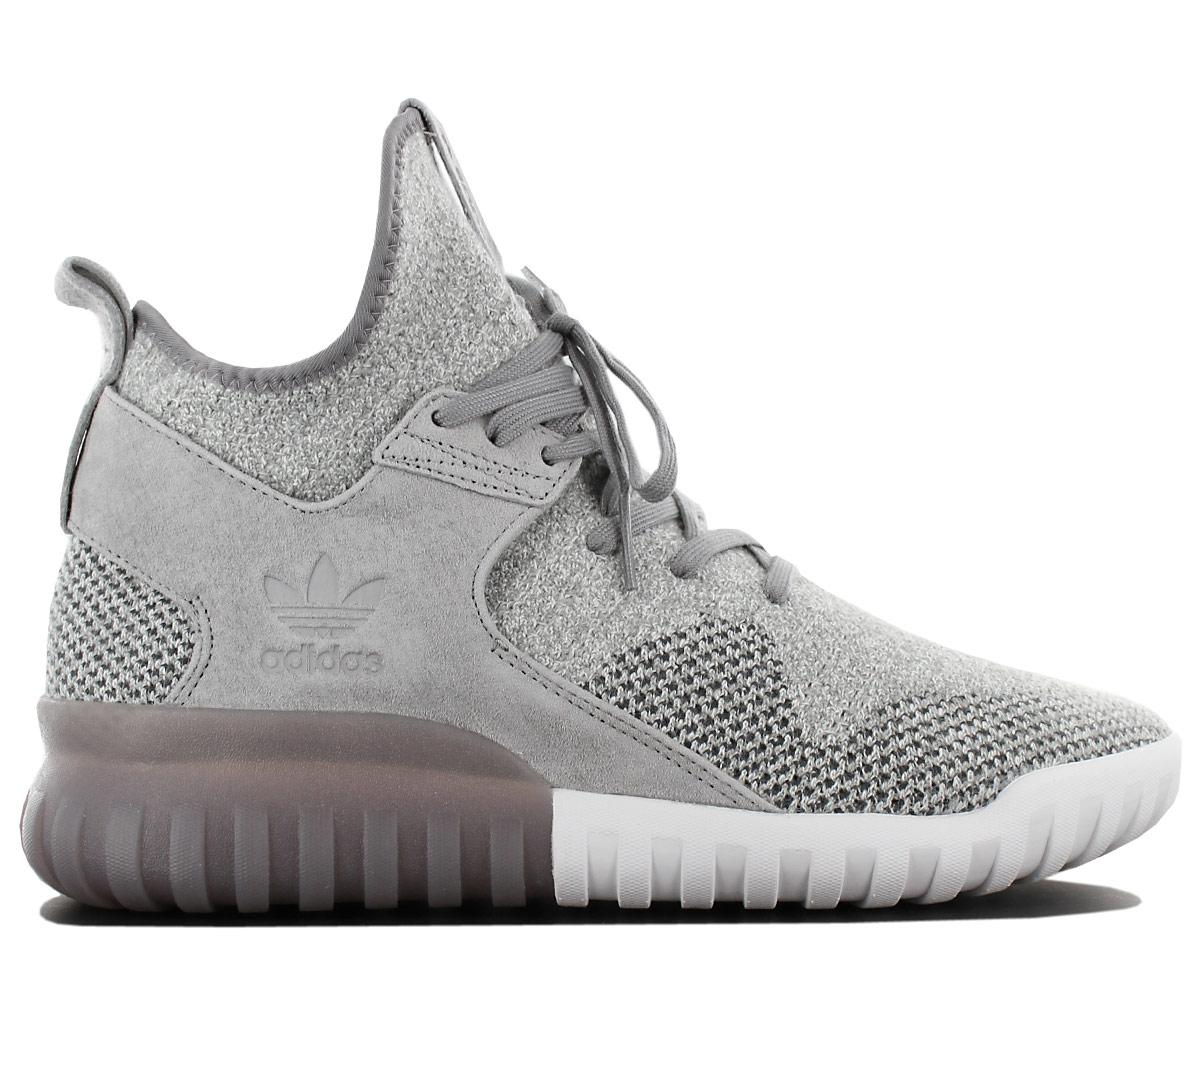 9ff4850687cd9 Details about Adidas Originals Tubular x Pk Primeknit Men's Sneaker mid  Shoes Grey BB2380